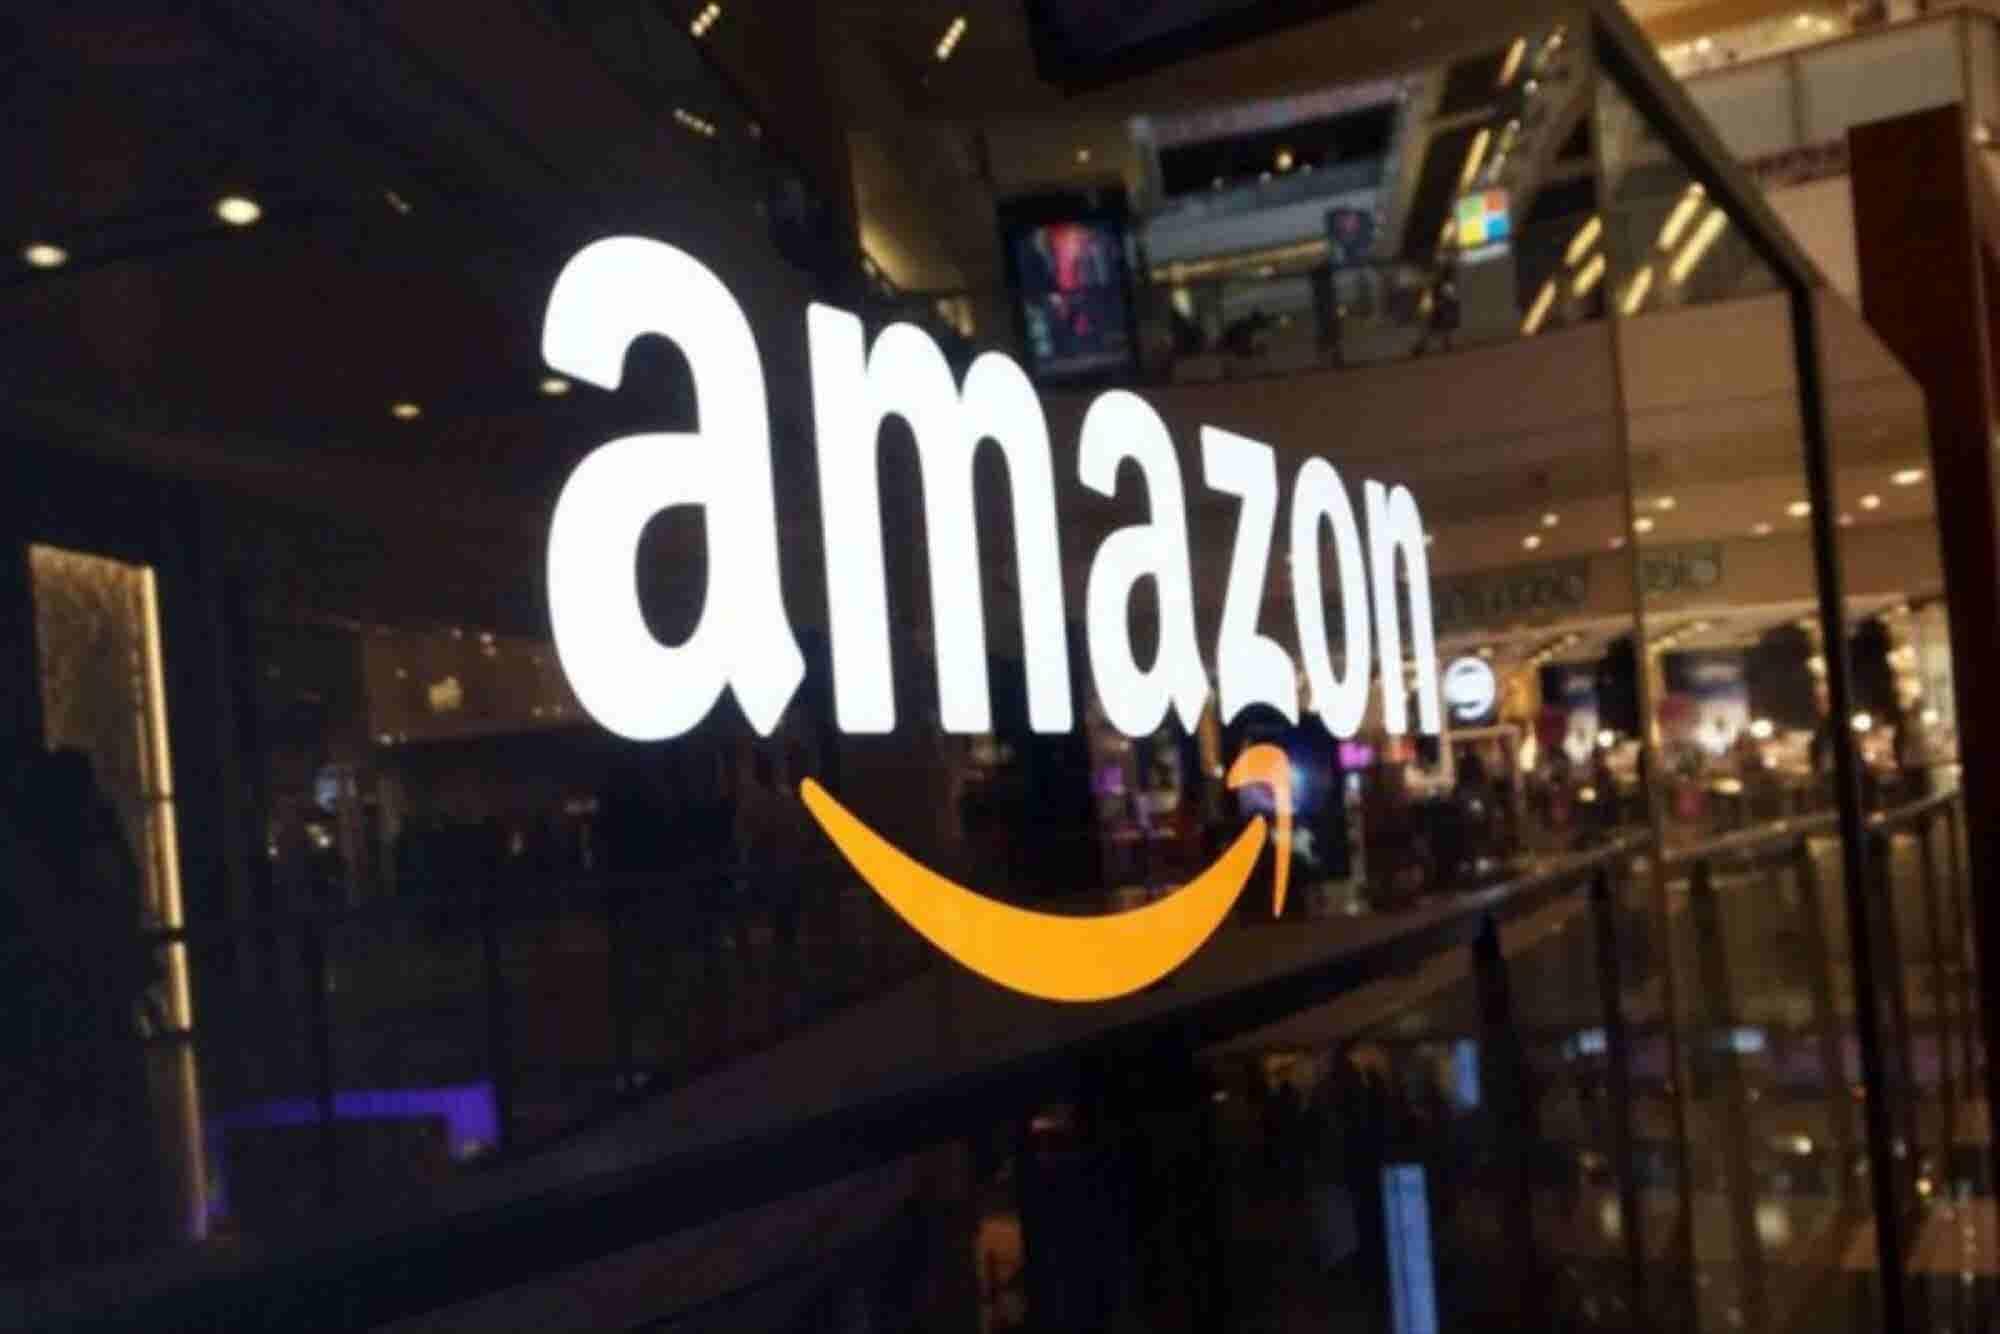 How Amazon is Making a Splash Through Eero's Acquisition